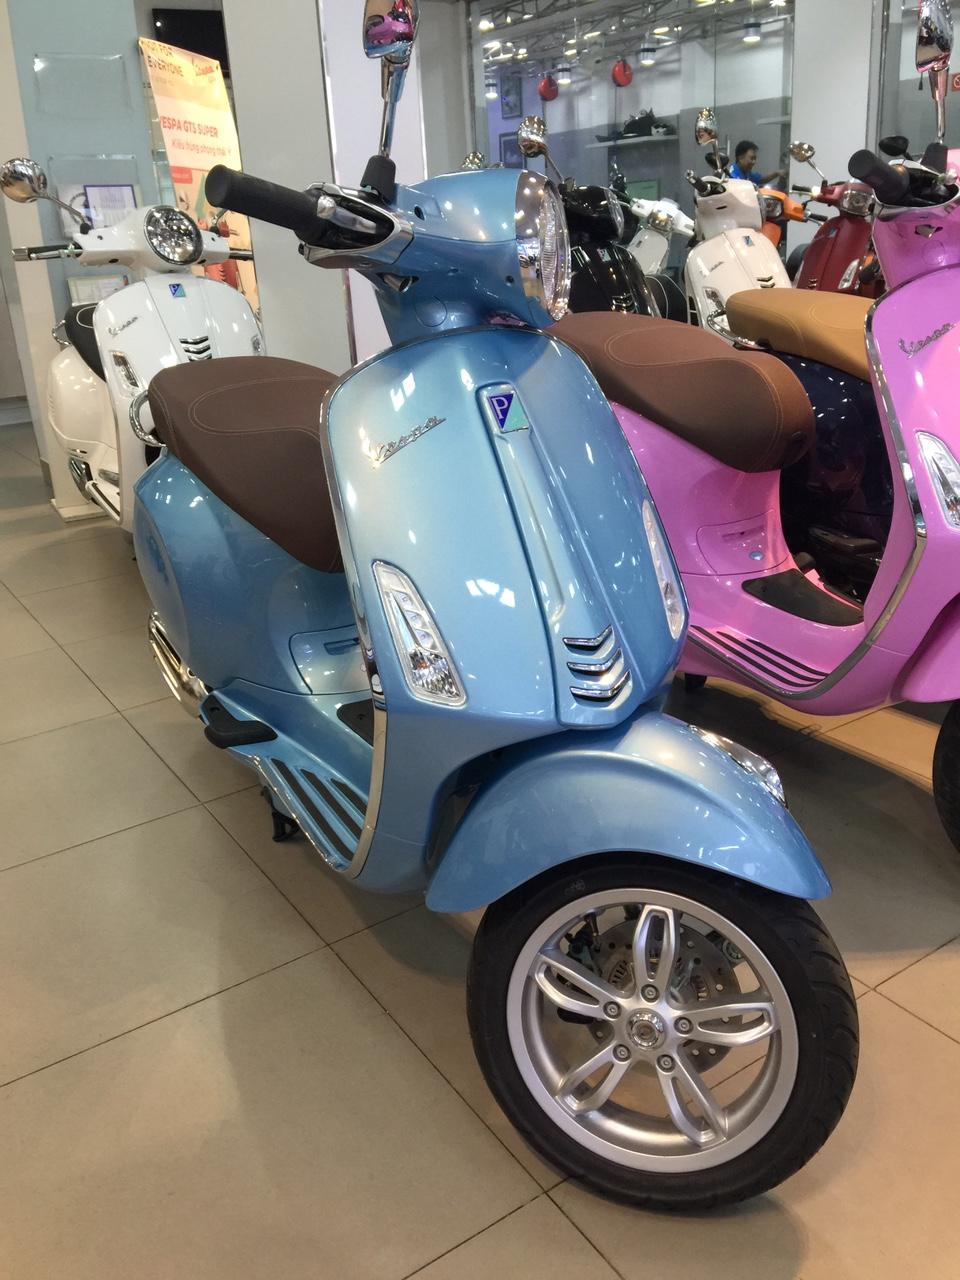 Mua xe Vespa Primavera 2017 tai HCM Chuong trinh Hot - 8